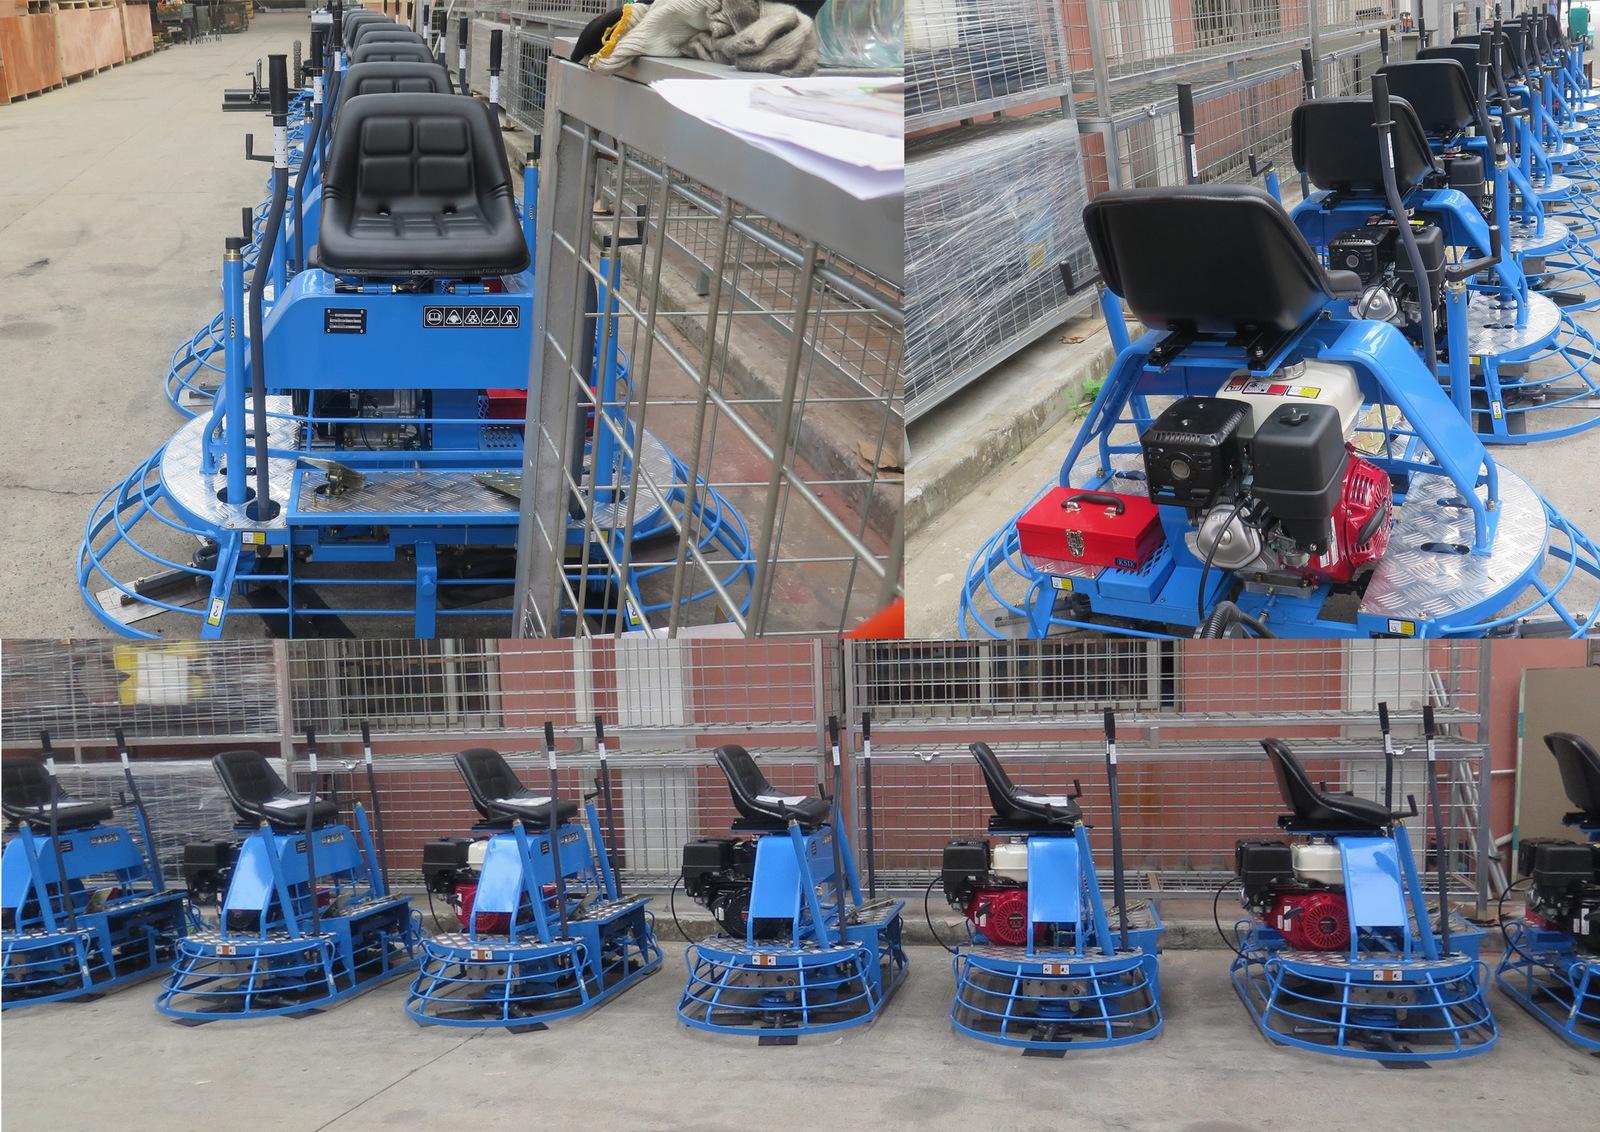 ERAY-830 concrete ride-on power trowel